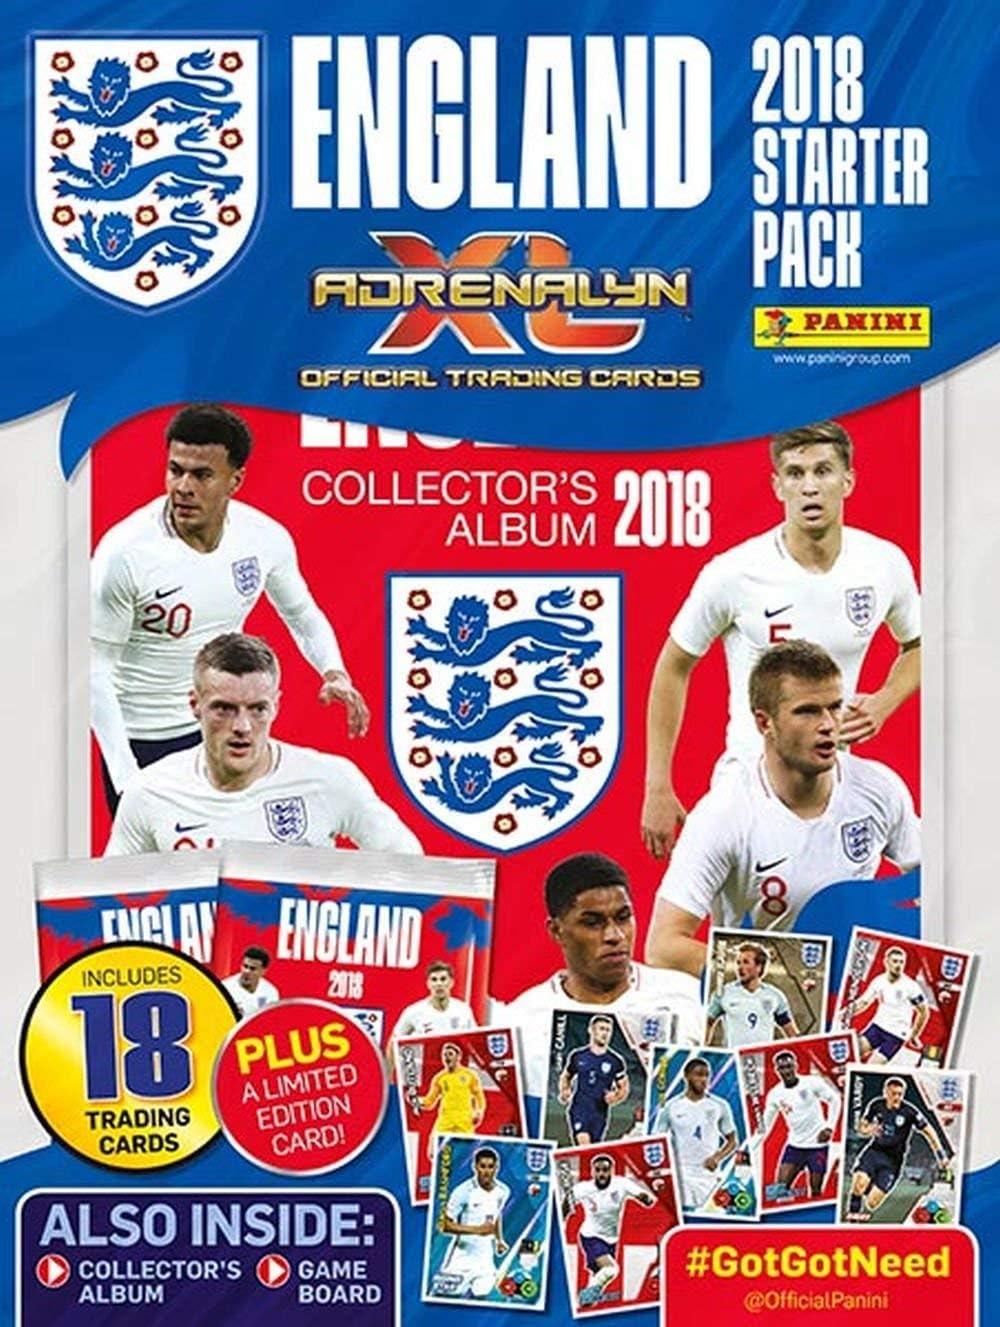 Panini Adrenalyn XL England 2018 Trading Card Starter Pack: Amazon.es: Juguetes y juegos